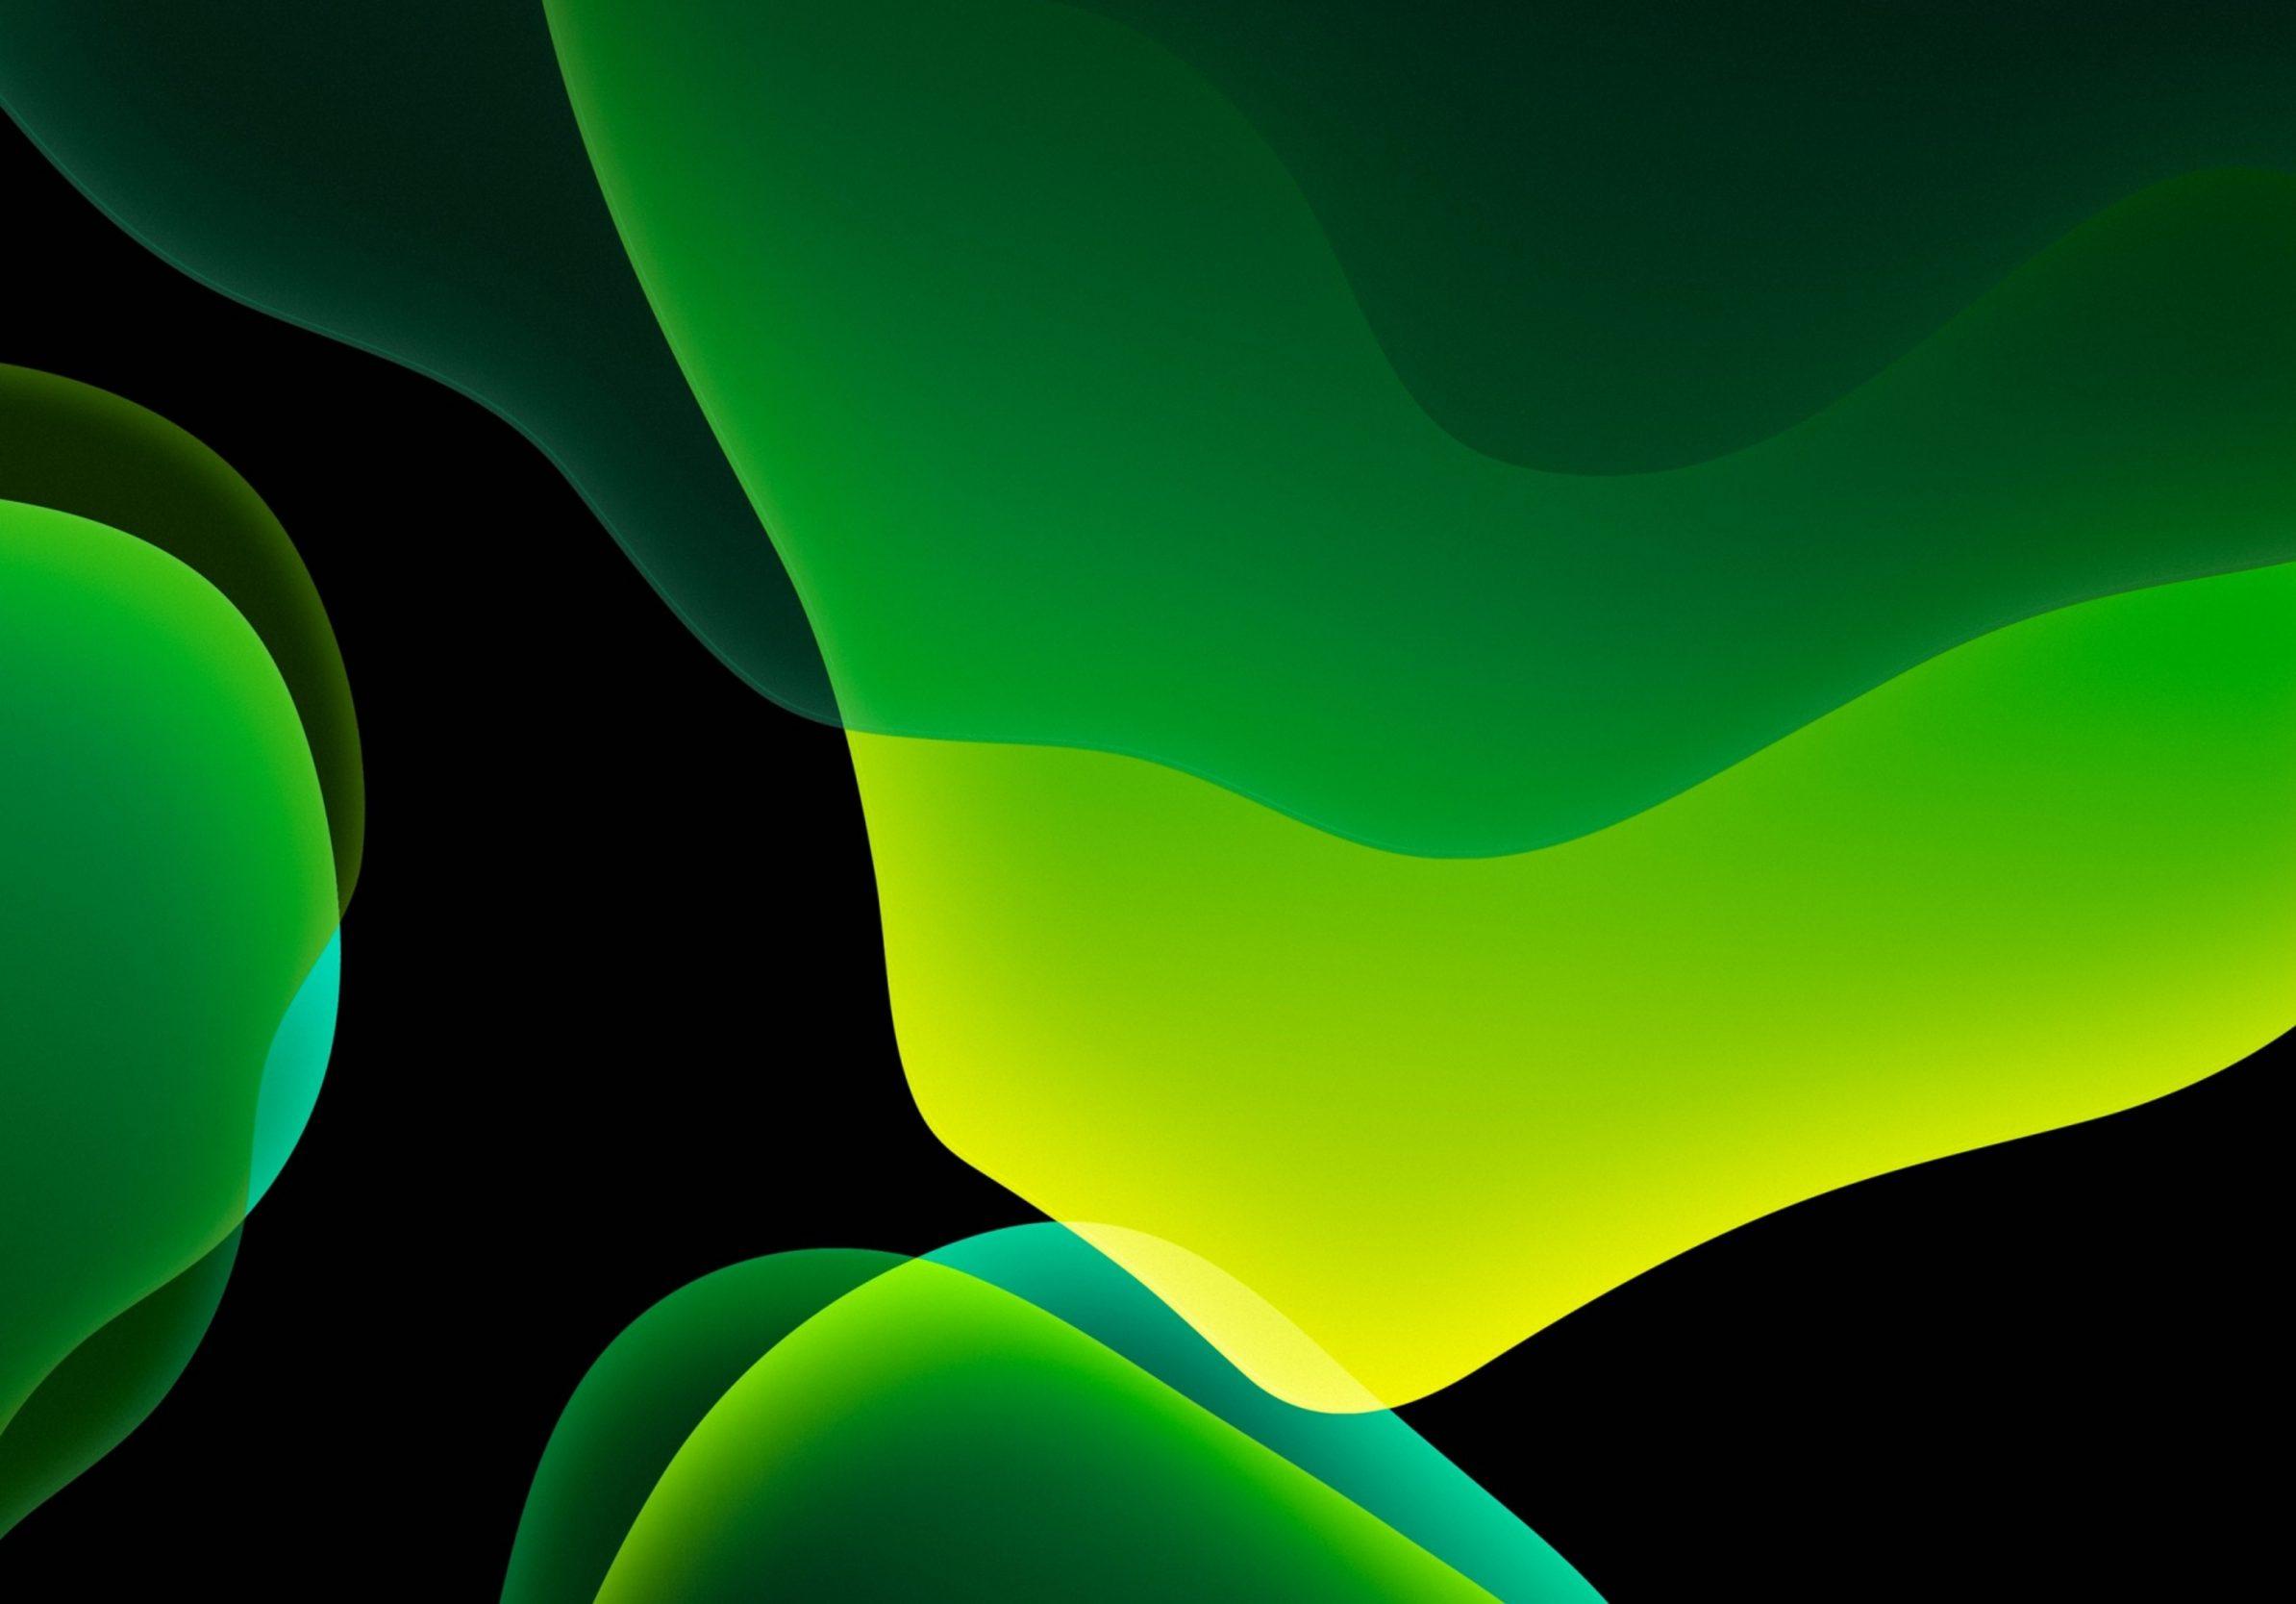 2388x1668 iPad Pro wallpapers Green Dark Ipados Ipad Wallpaper 2388x1668 pixels resolution